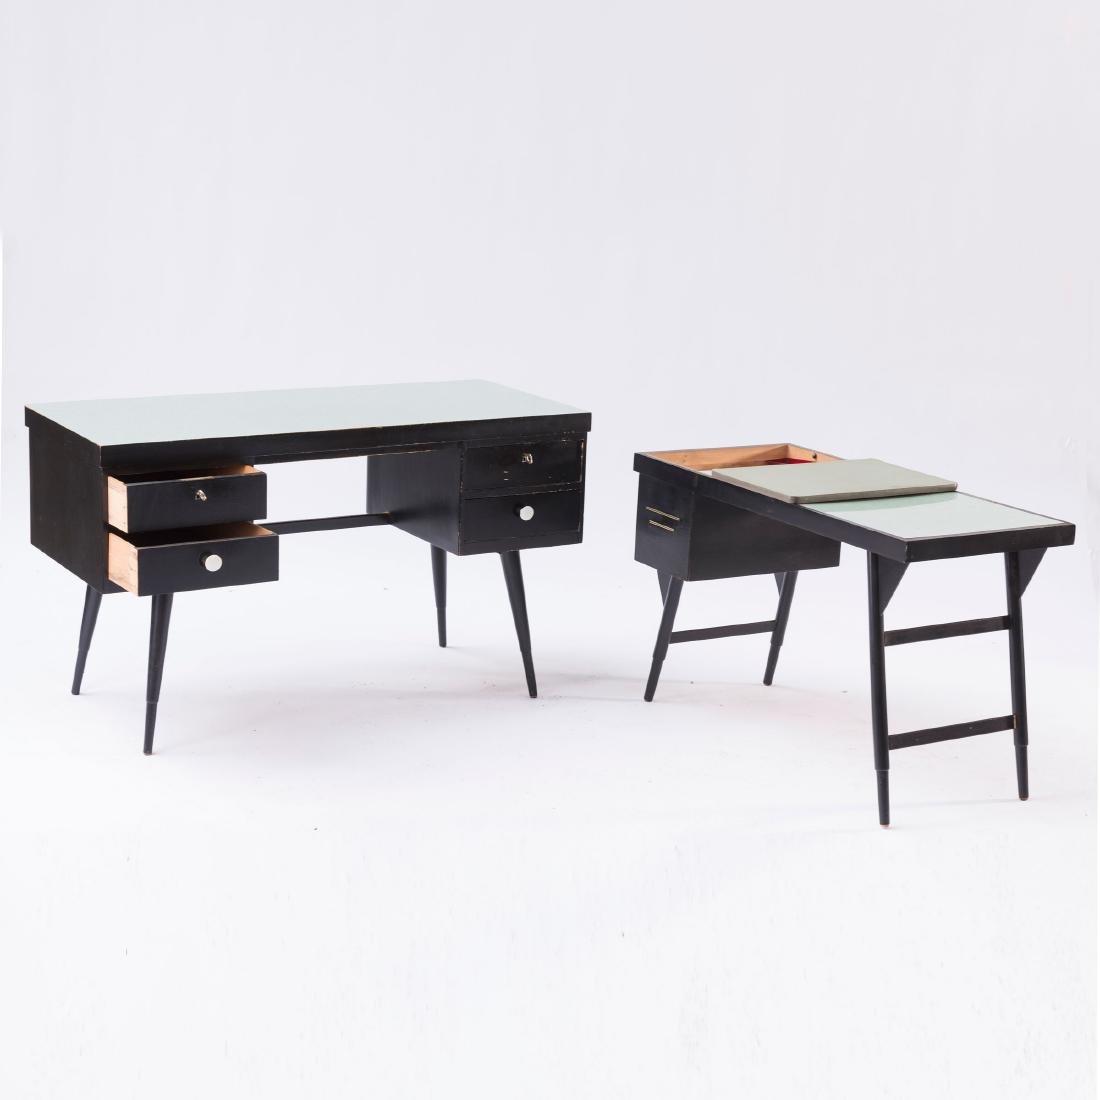 Desk and typewriter desk, c. 1955 - 2